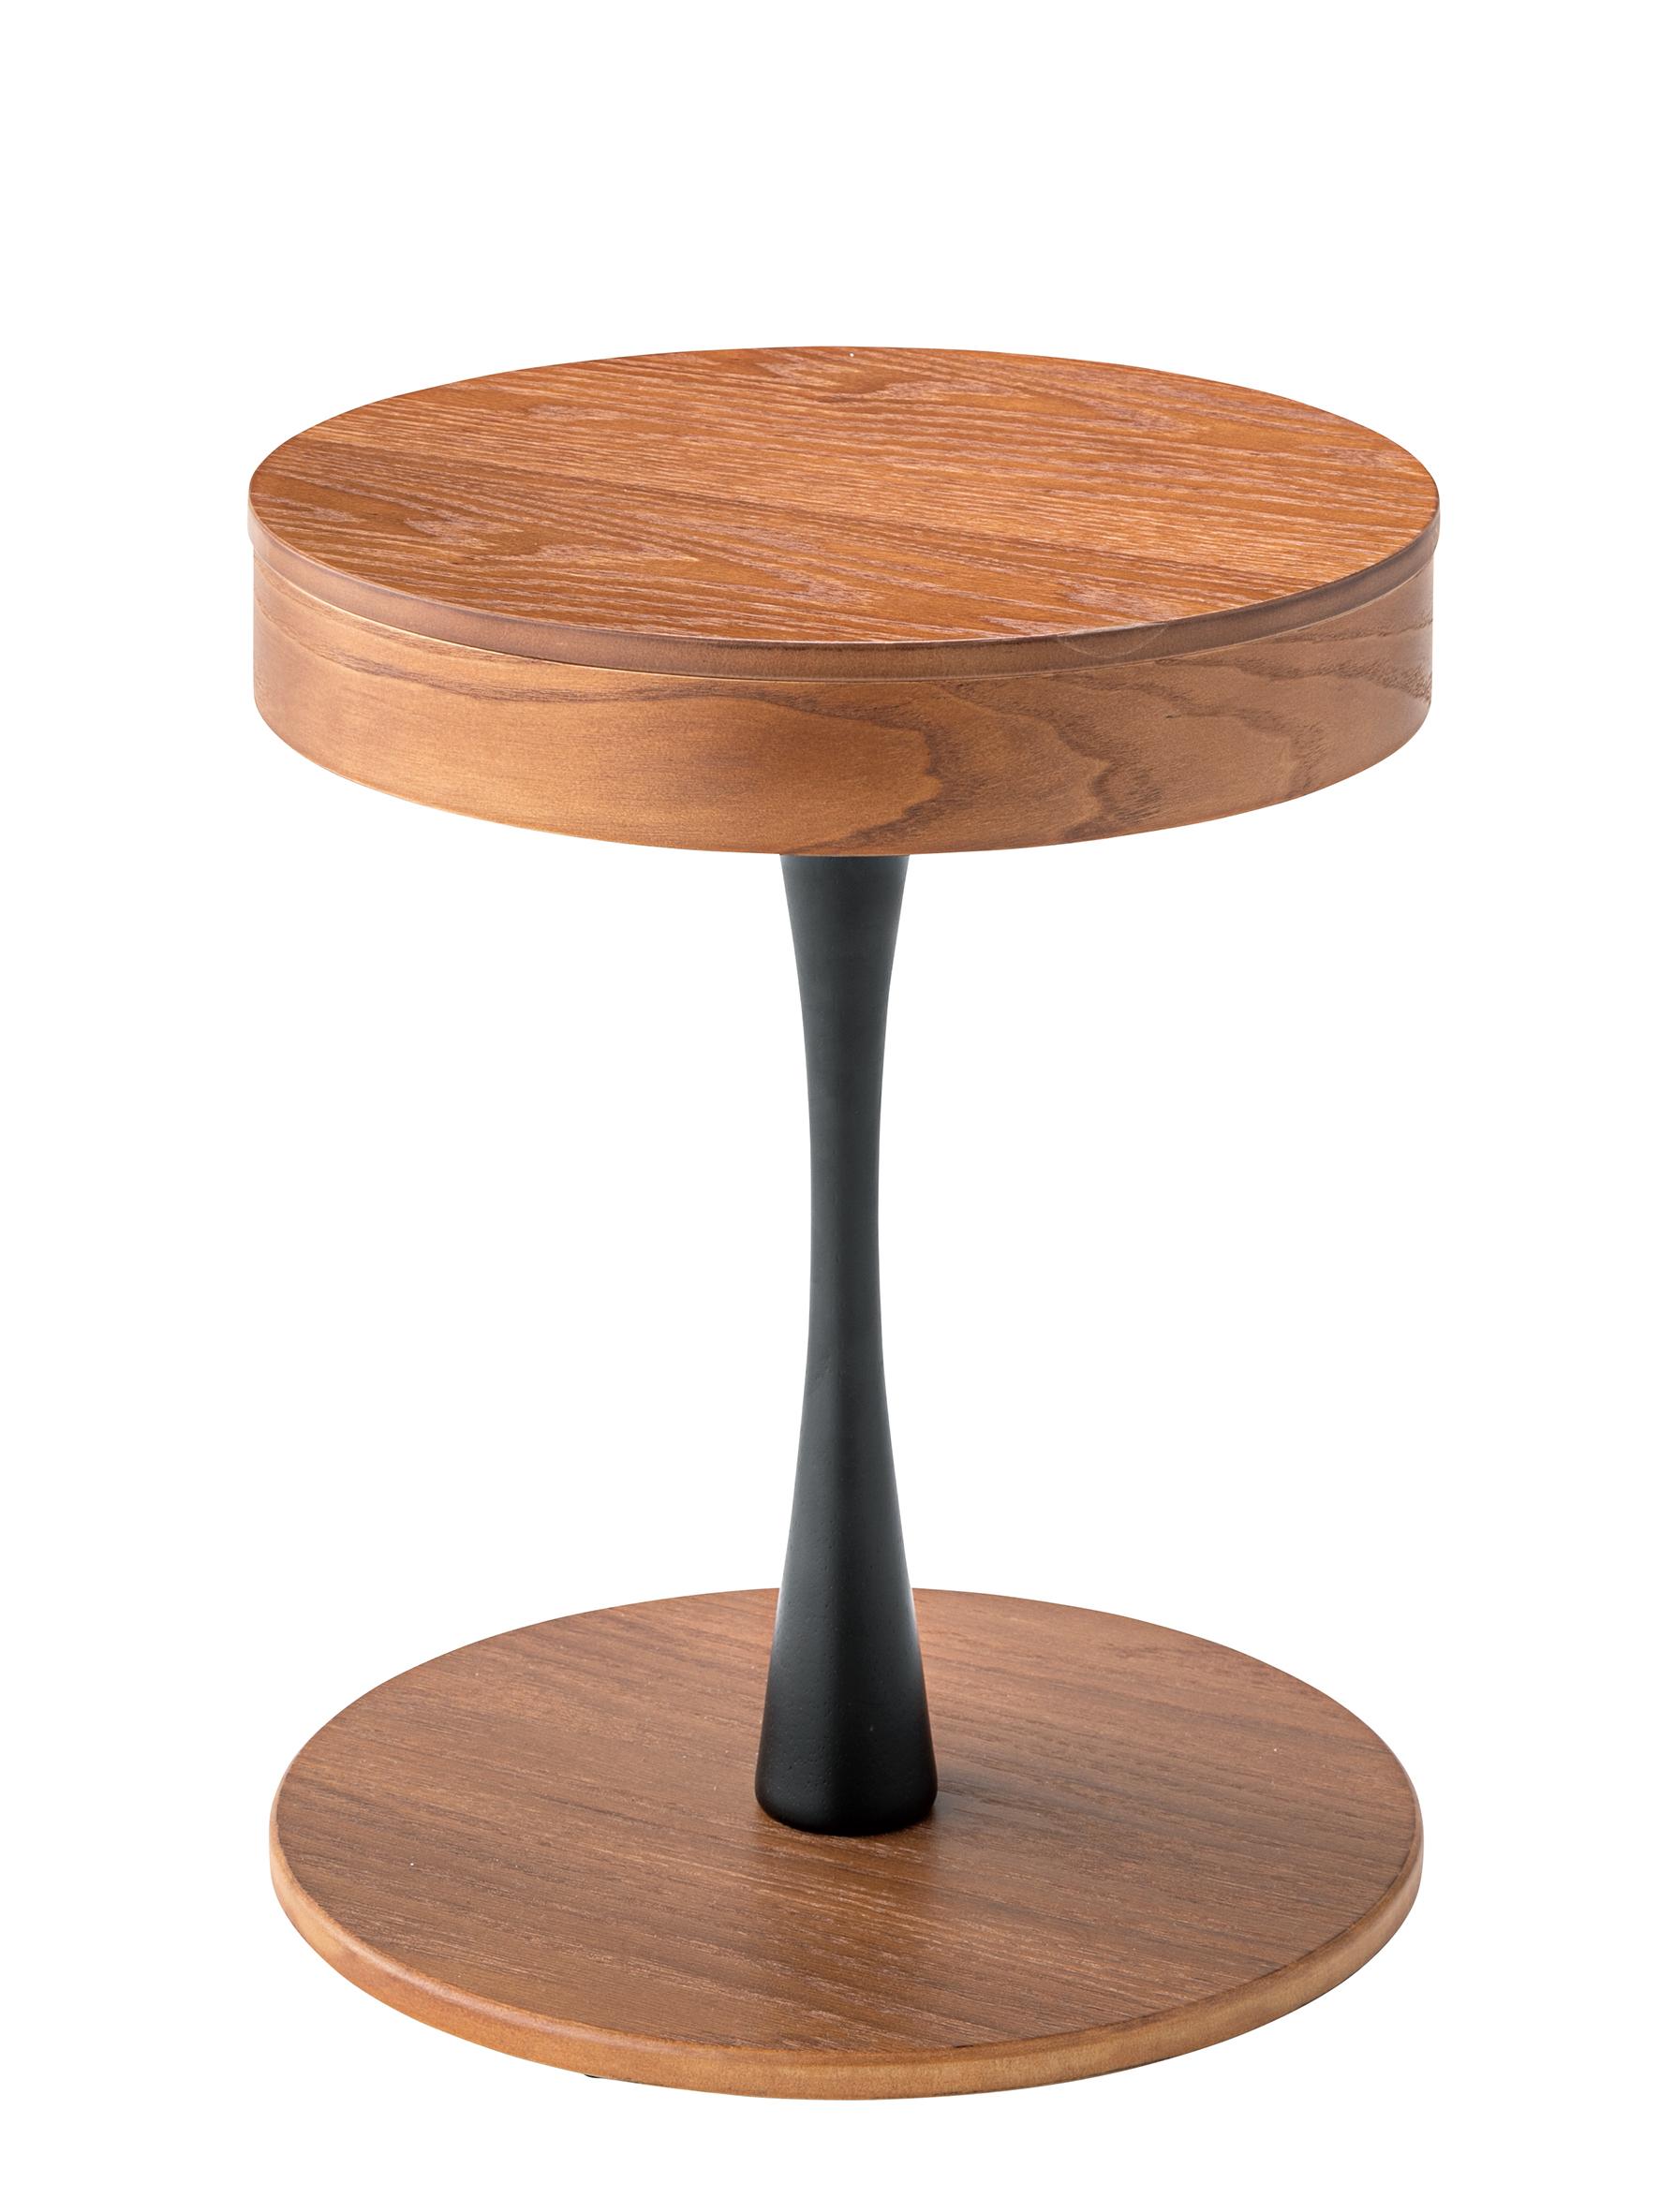 Wood Side Table / 北欧スタイル 収納付サイドテーブル